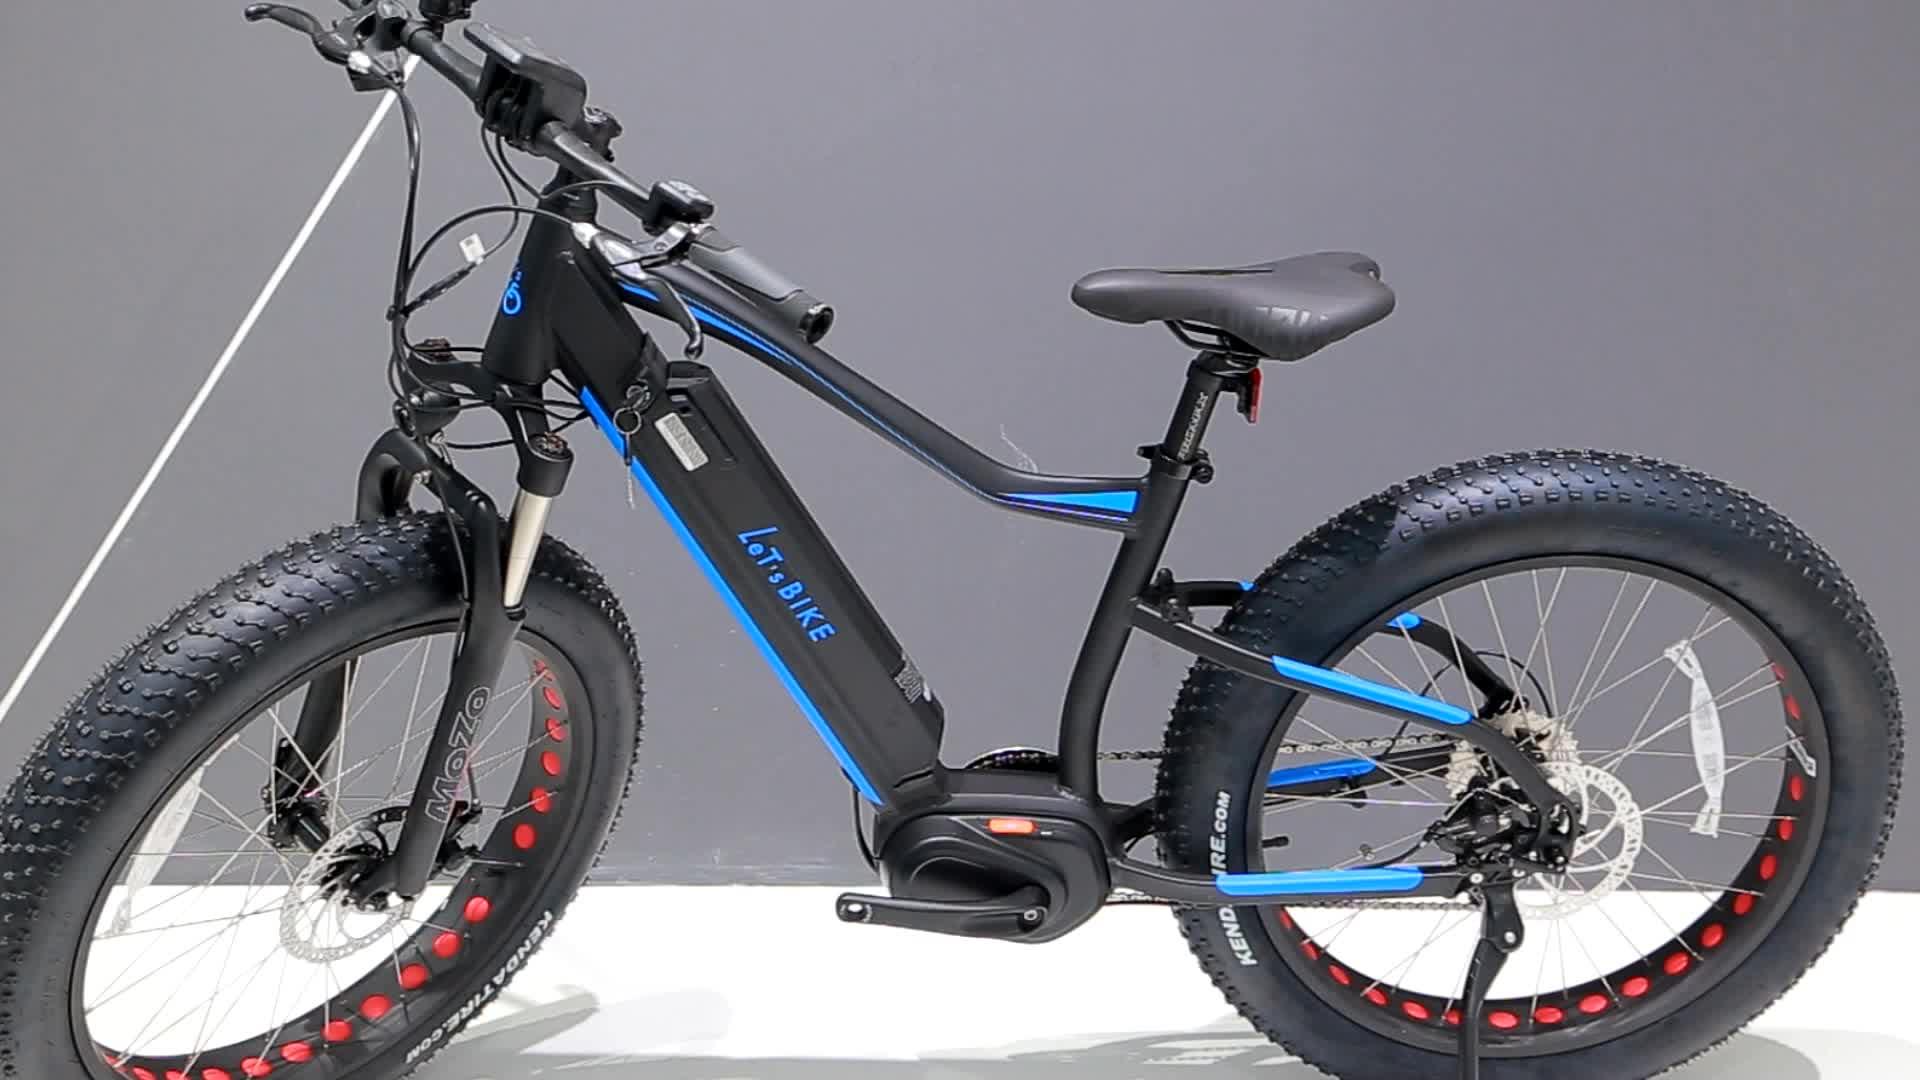 250W-750W bafang motor Fat Electric bike/ high quality fat E-bike with low price MTB bike